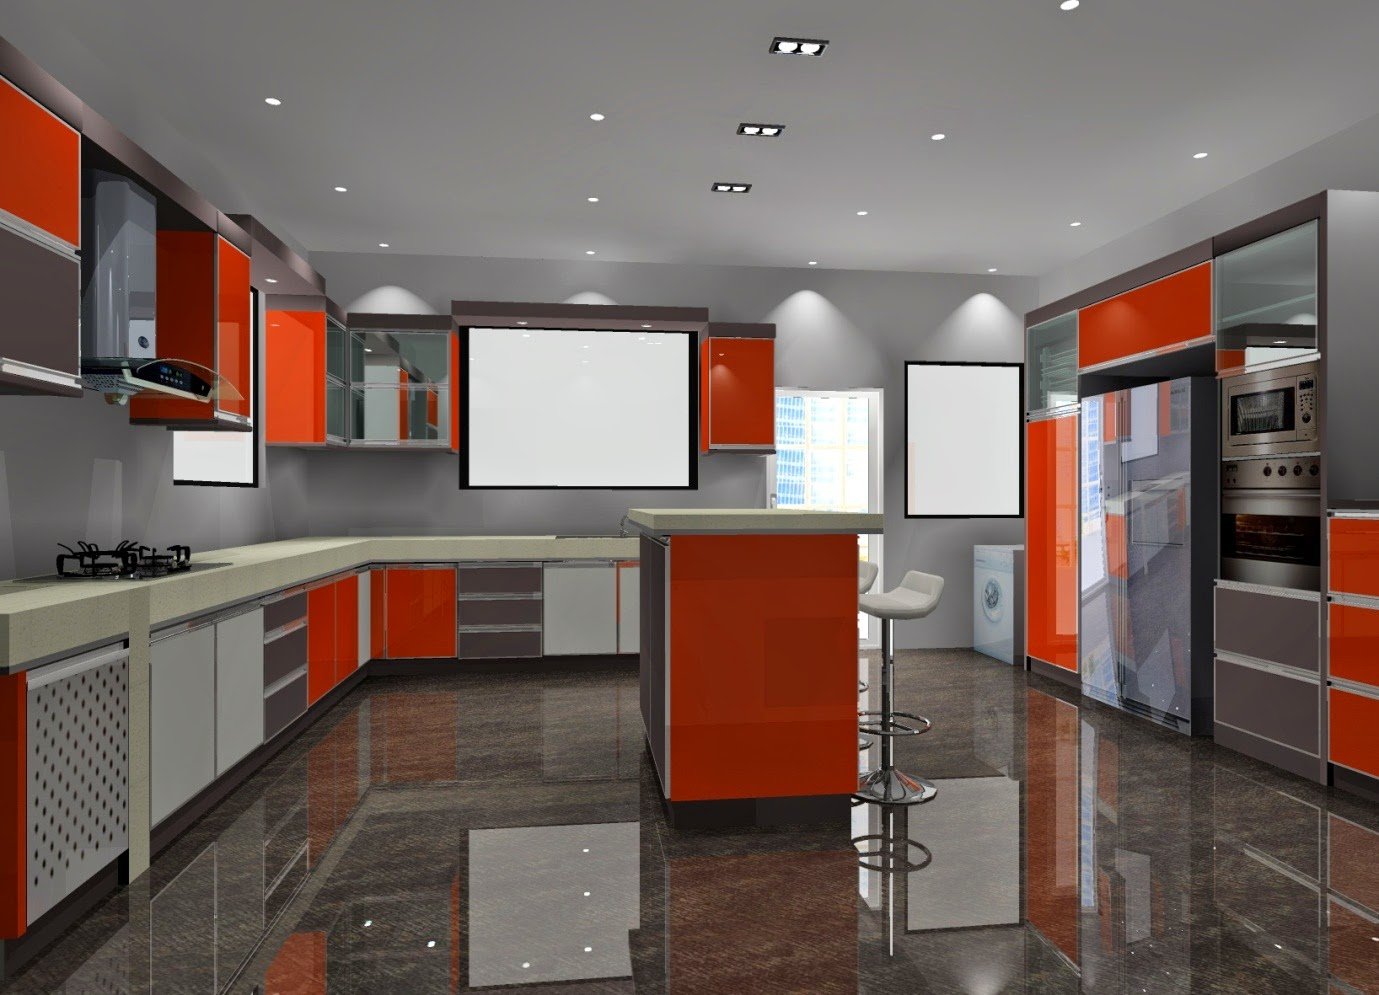 Kabinet Dapur Ini Sangat Ekslusif Dengan Ilham Dari Rekabentuk Internet Pelanggan Meminta Untuk Memainkan Warna Formica Merah Gloss Kelabu Serta